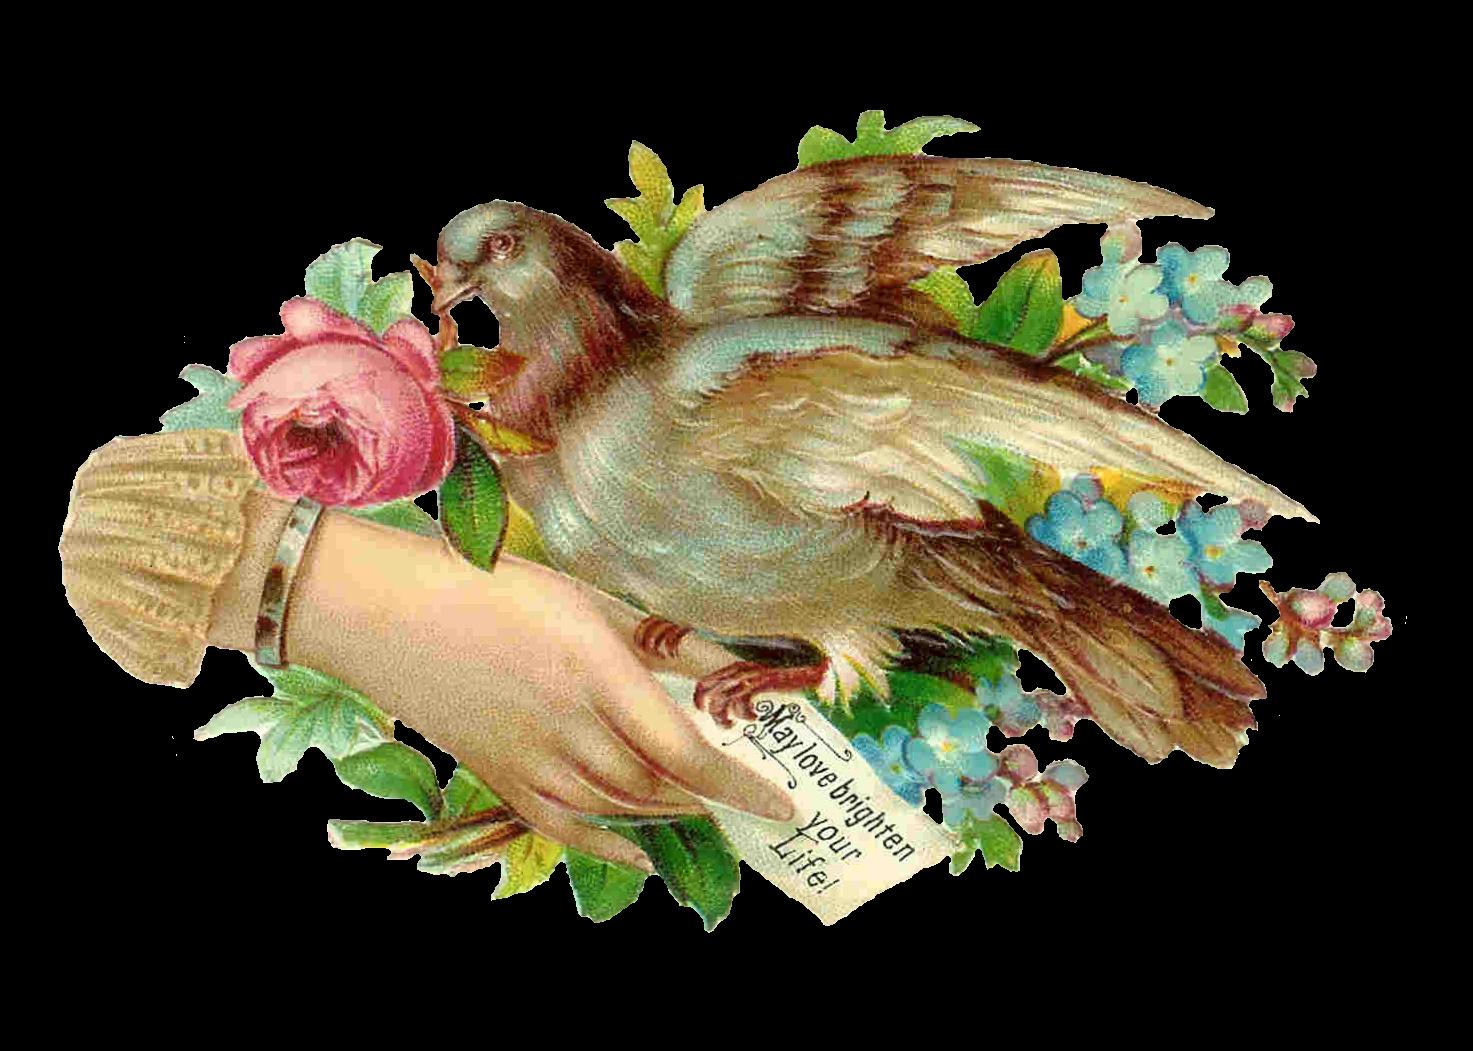 Своими руками, открытка с юбилеем с голубями